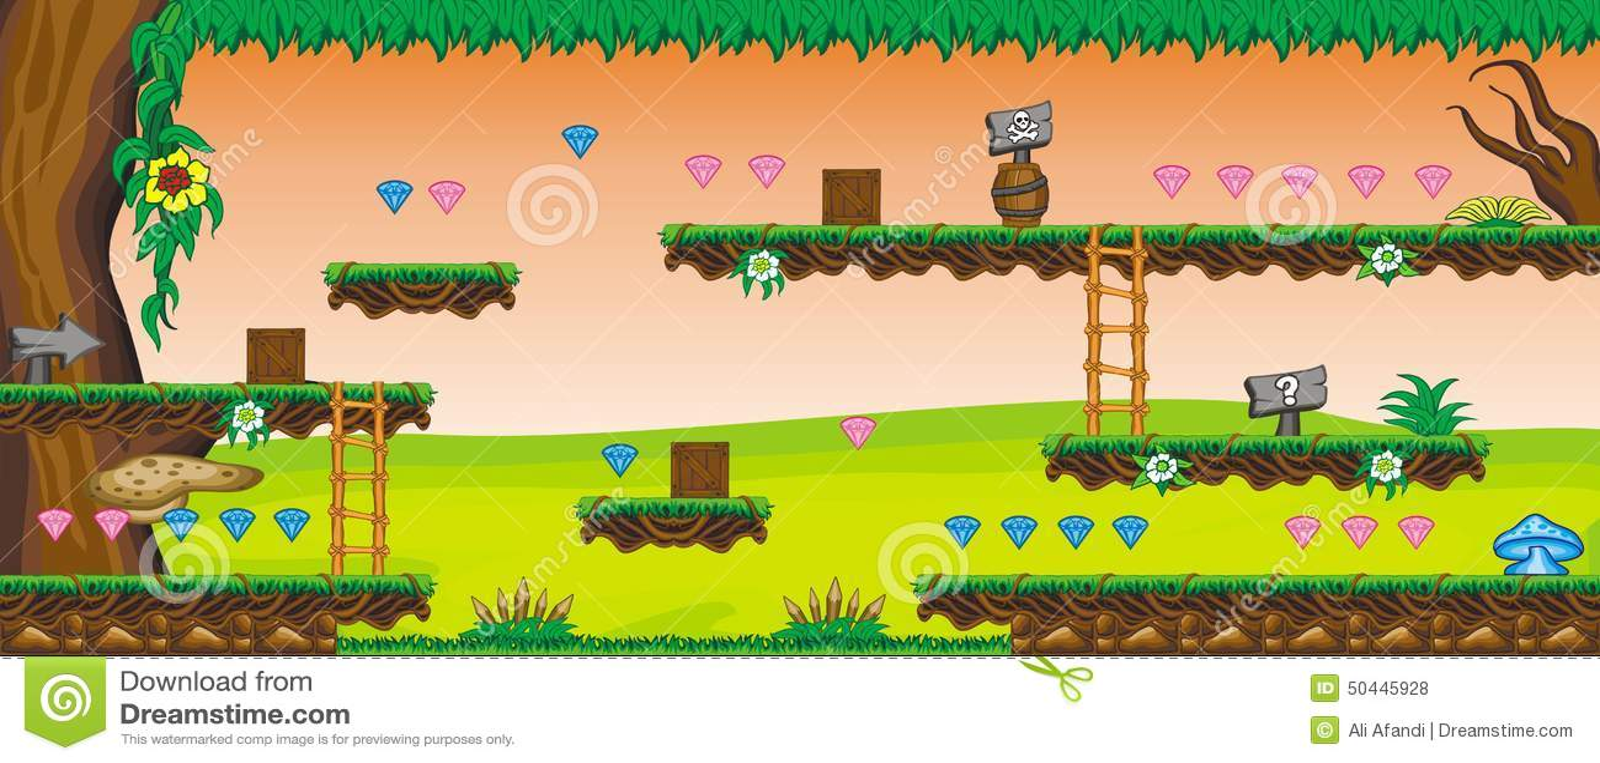 2D Tileset Platform Game 58 Stock Vector - Illustration of